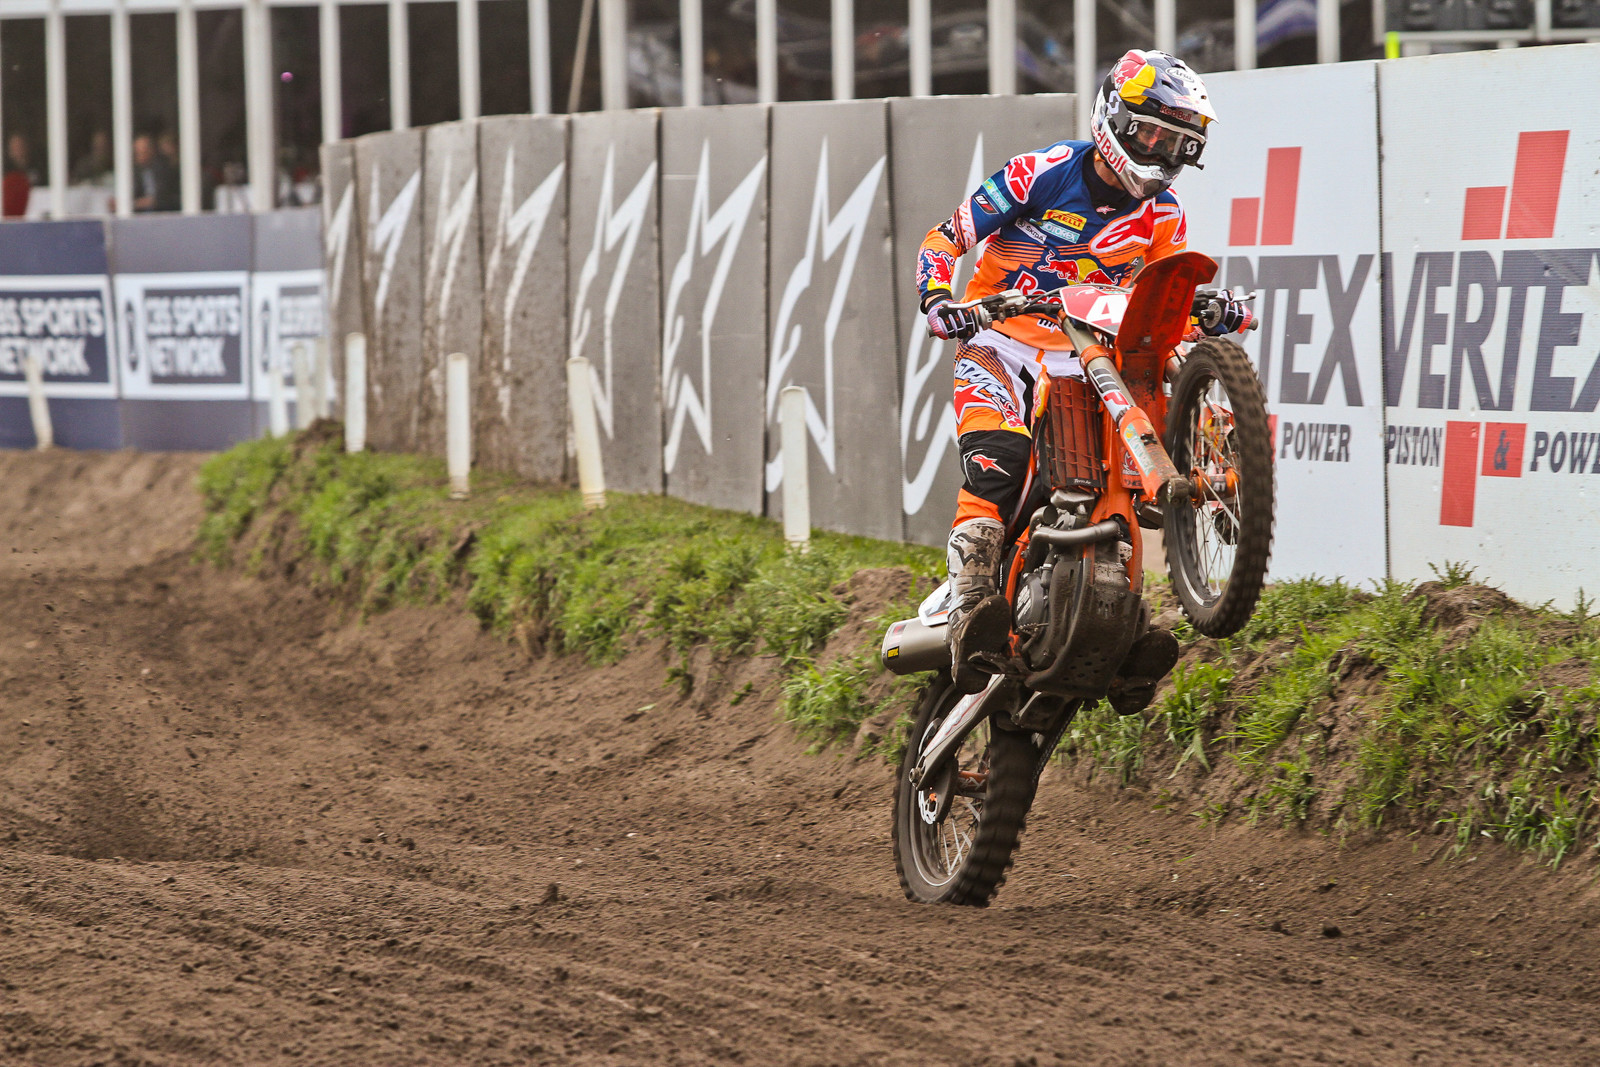 Pauls Jonass - Photo Blast: 2017 MXGP of Valkenswaard - Motocross Pictures - Vital MX